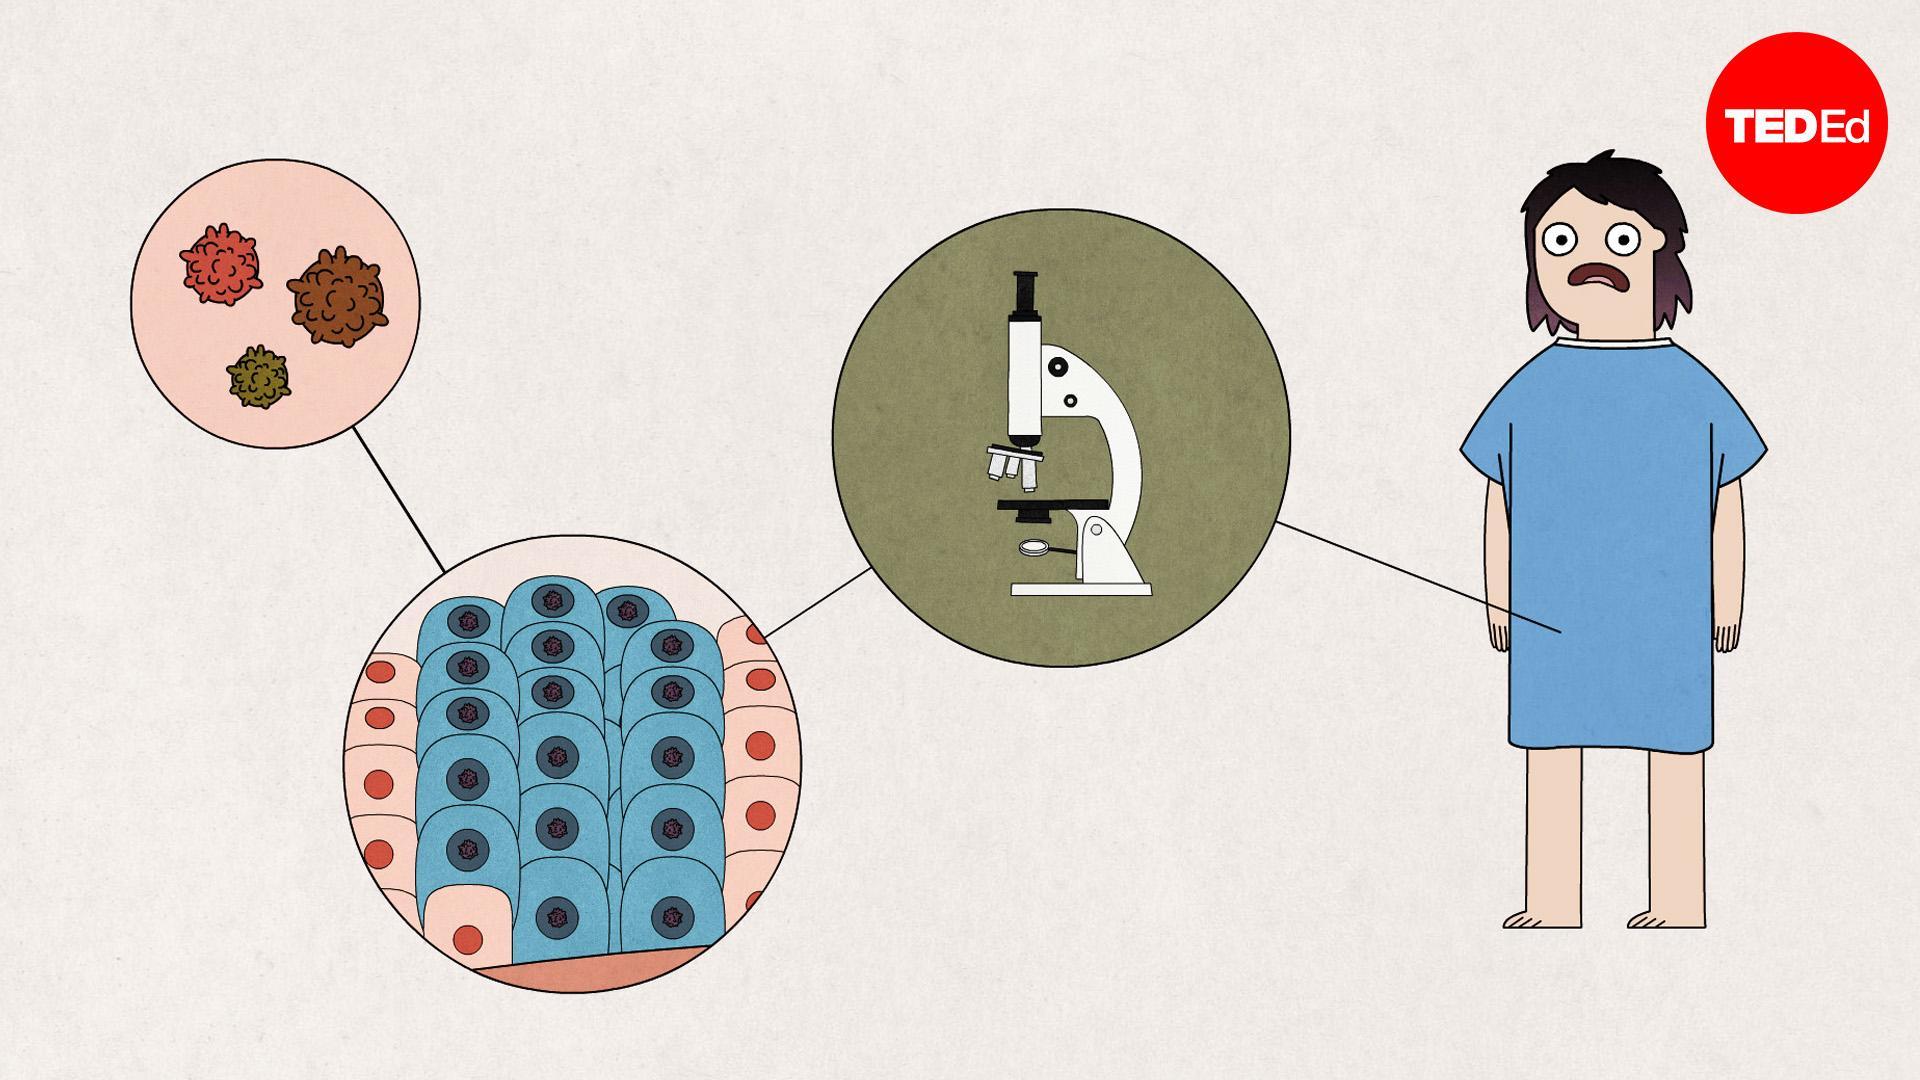 il papilloma virus rimane a vita